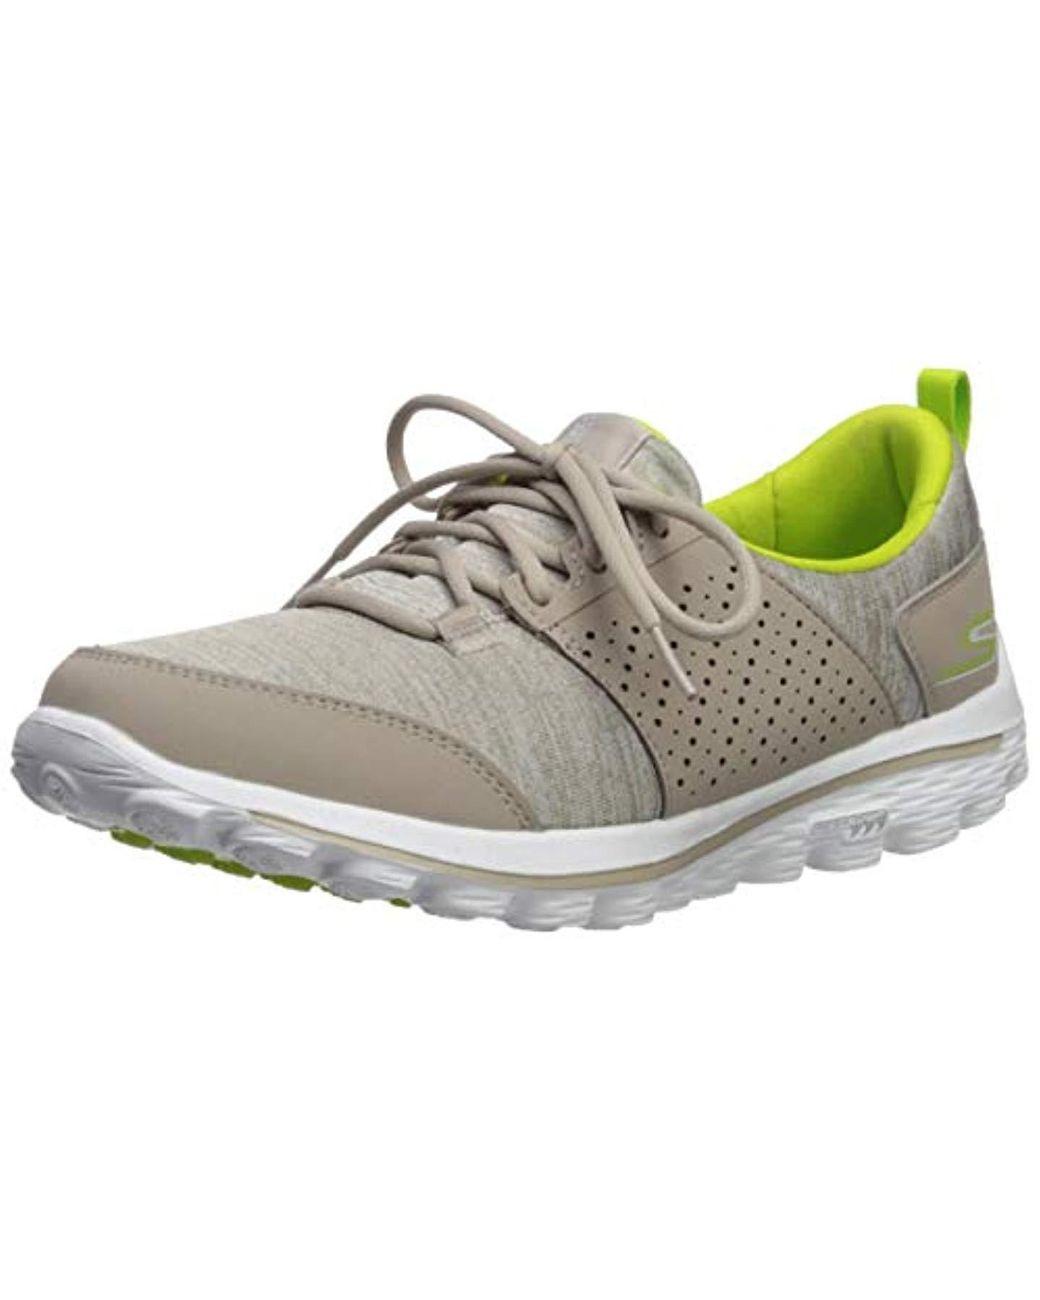 Skechers Go Walk 2 Sugar Relaxed Fit Golf Shoe Lyst